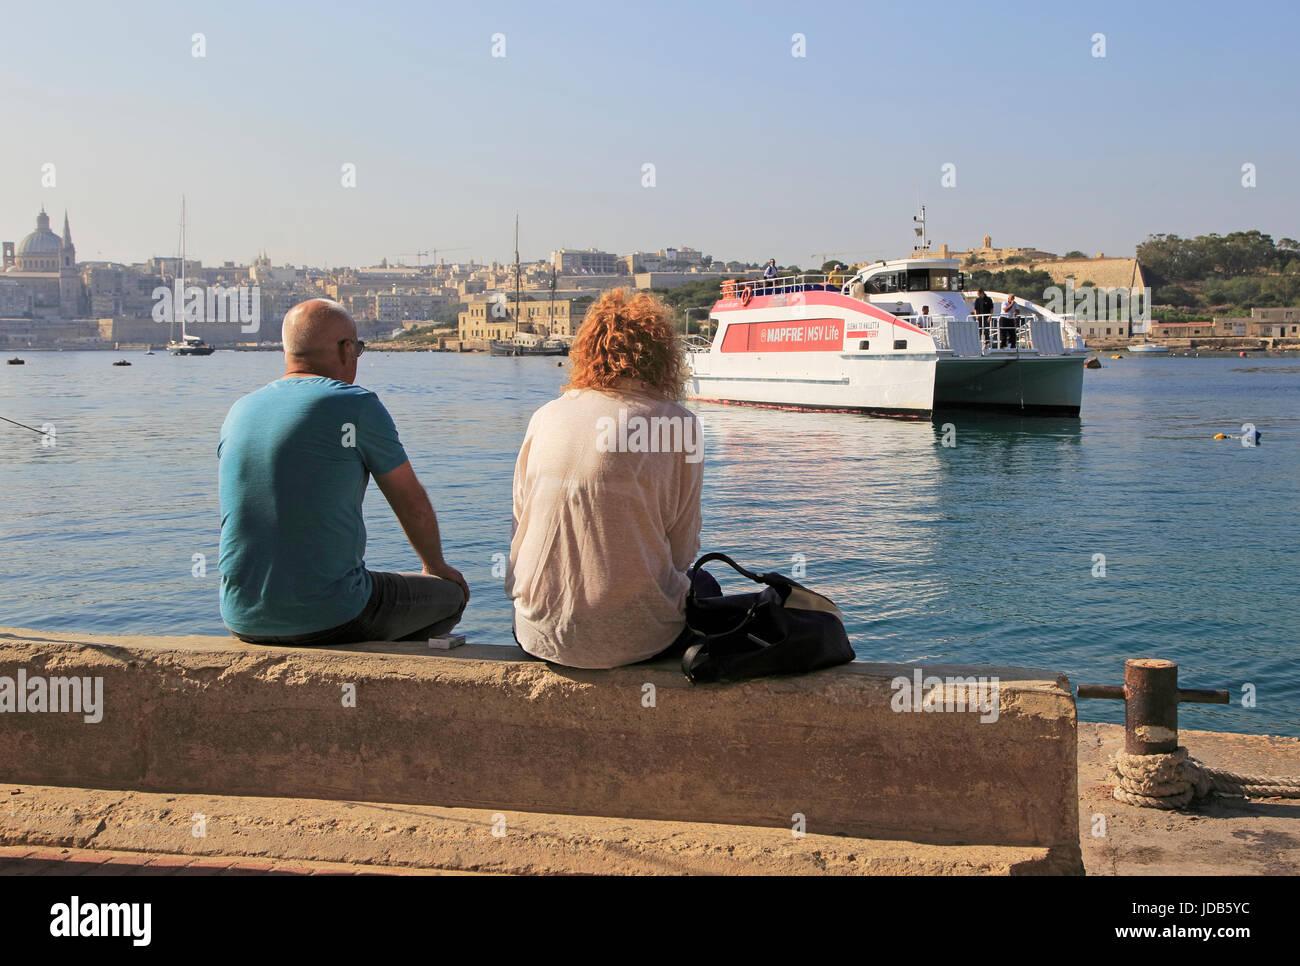 Mapfre catamaran ferry arriving at Sliema from Valletta, Malta - Stock Image